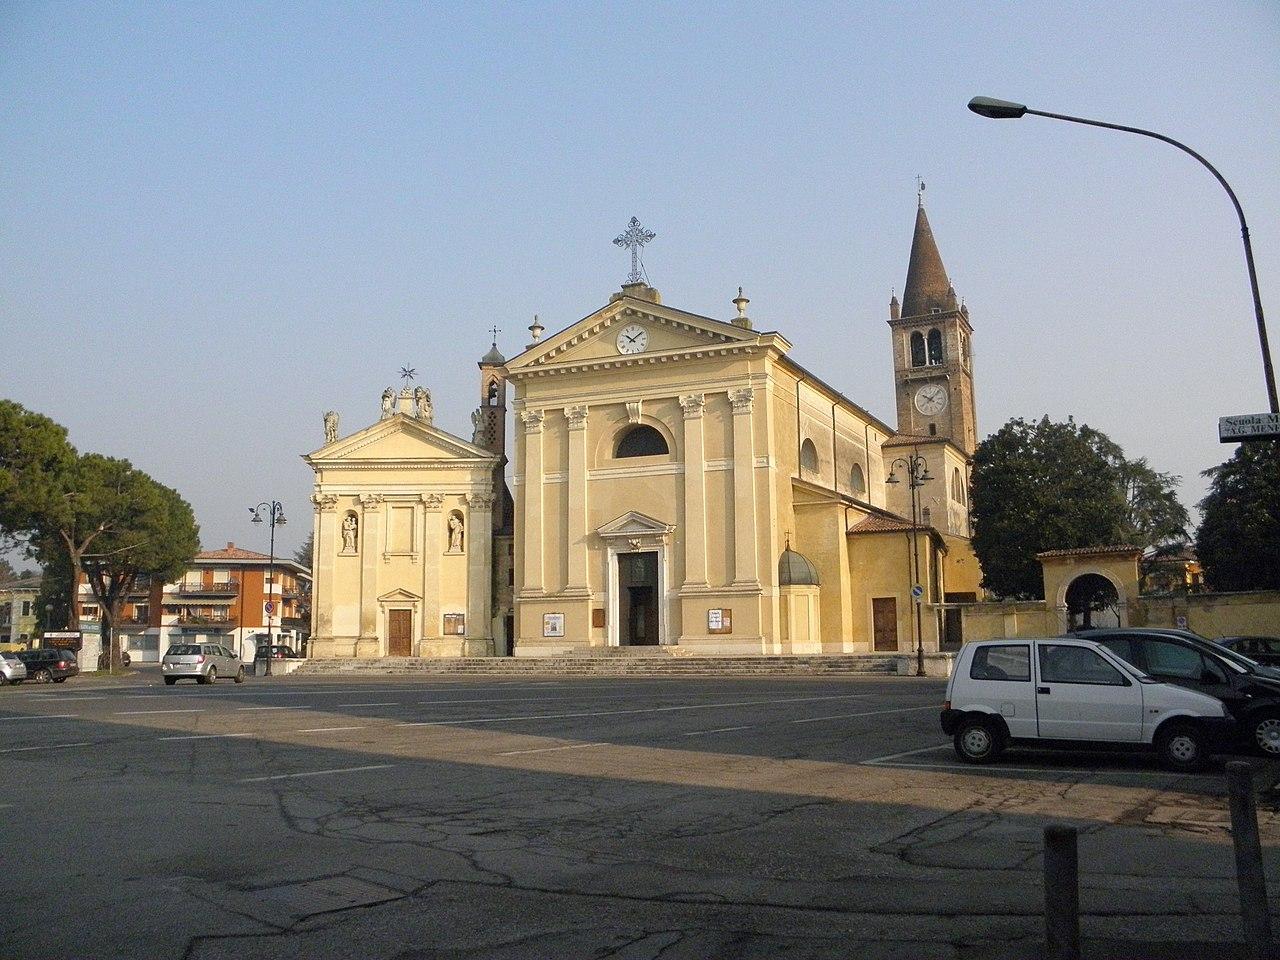 File:San Pietro e Oratorio (Zevio).jpg - Wikimedia Commons